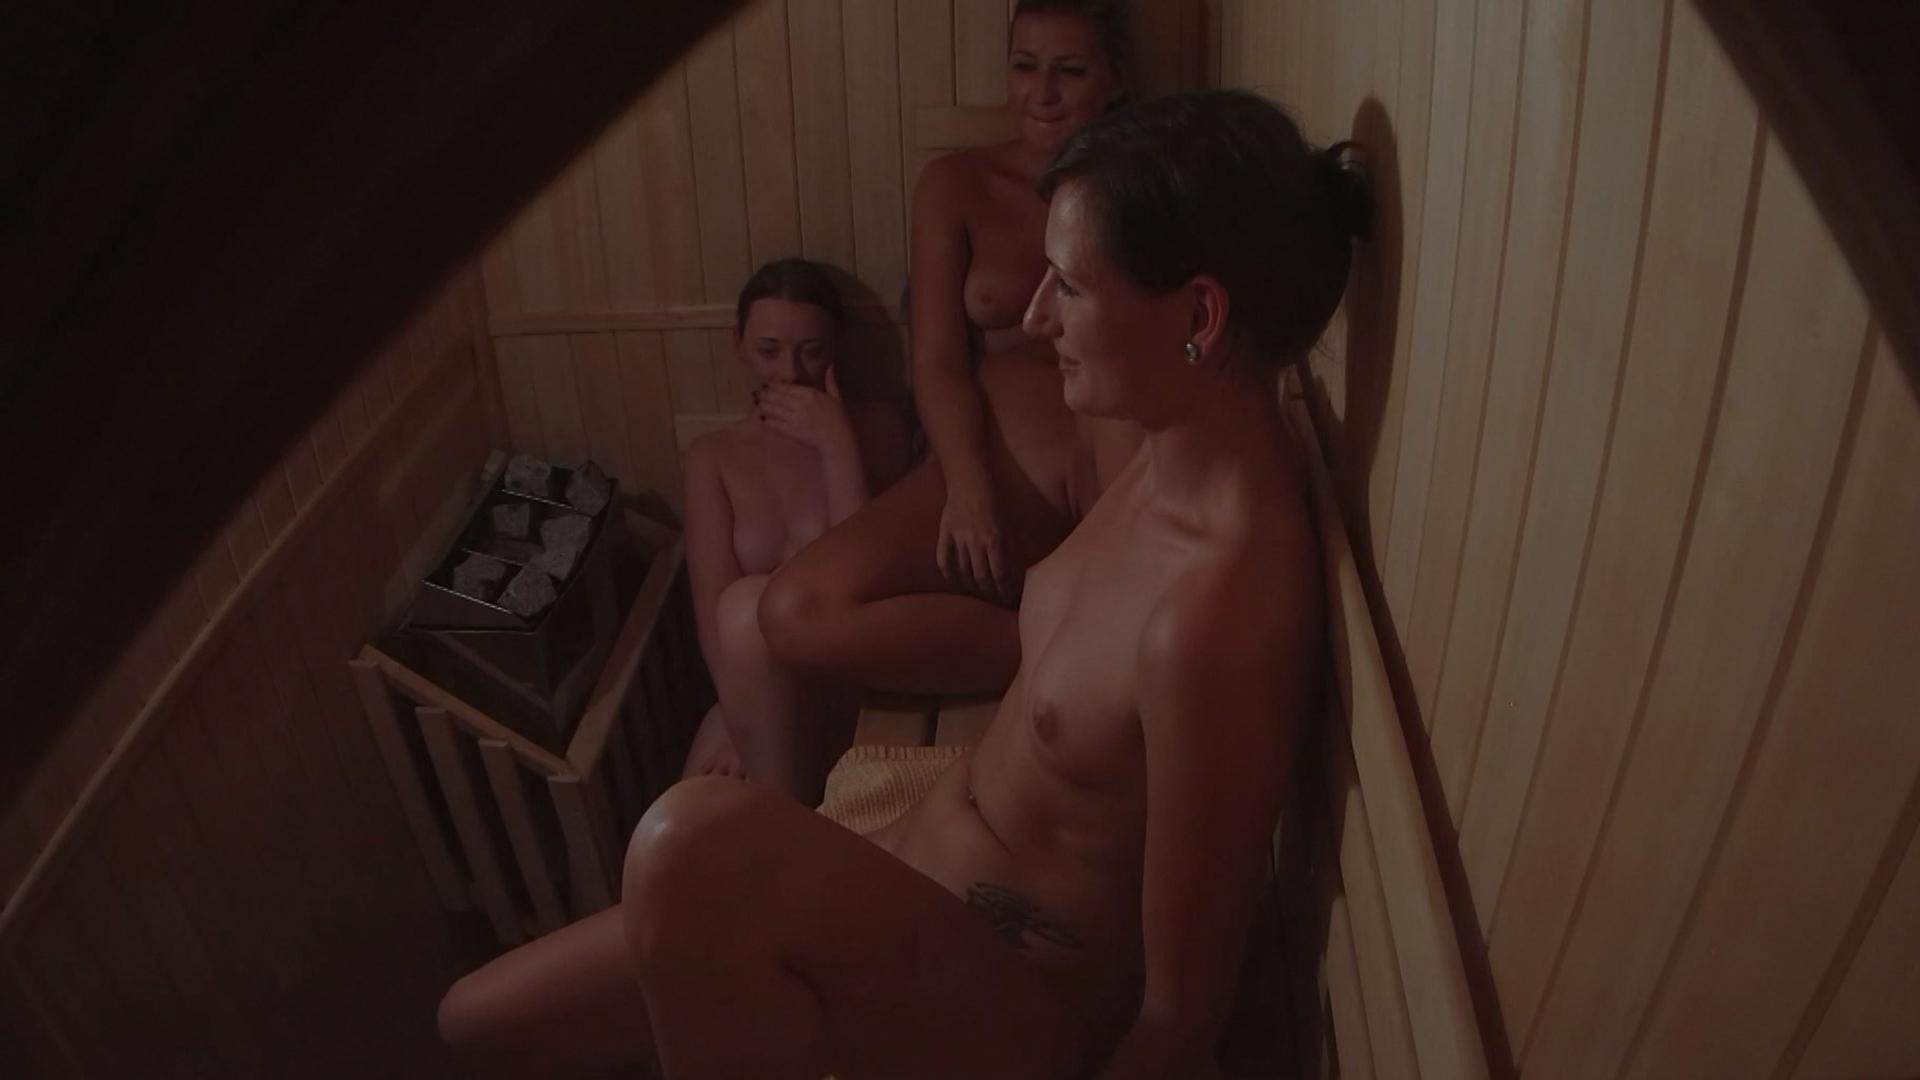 Скрытая порно в сауне